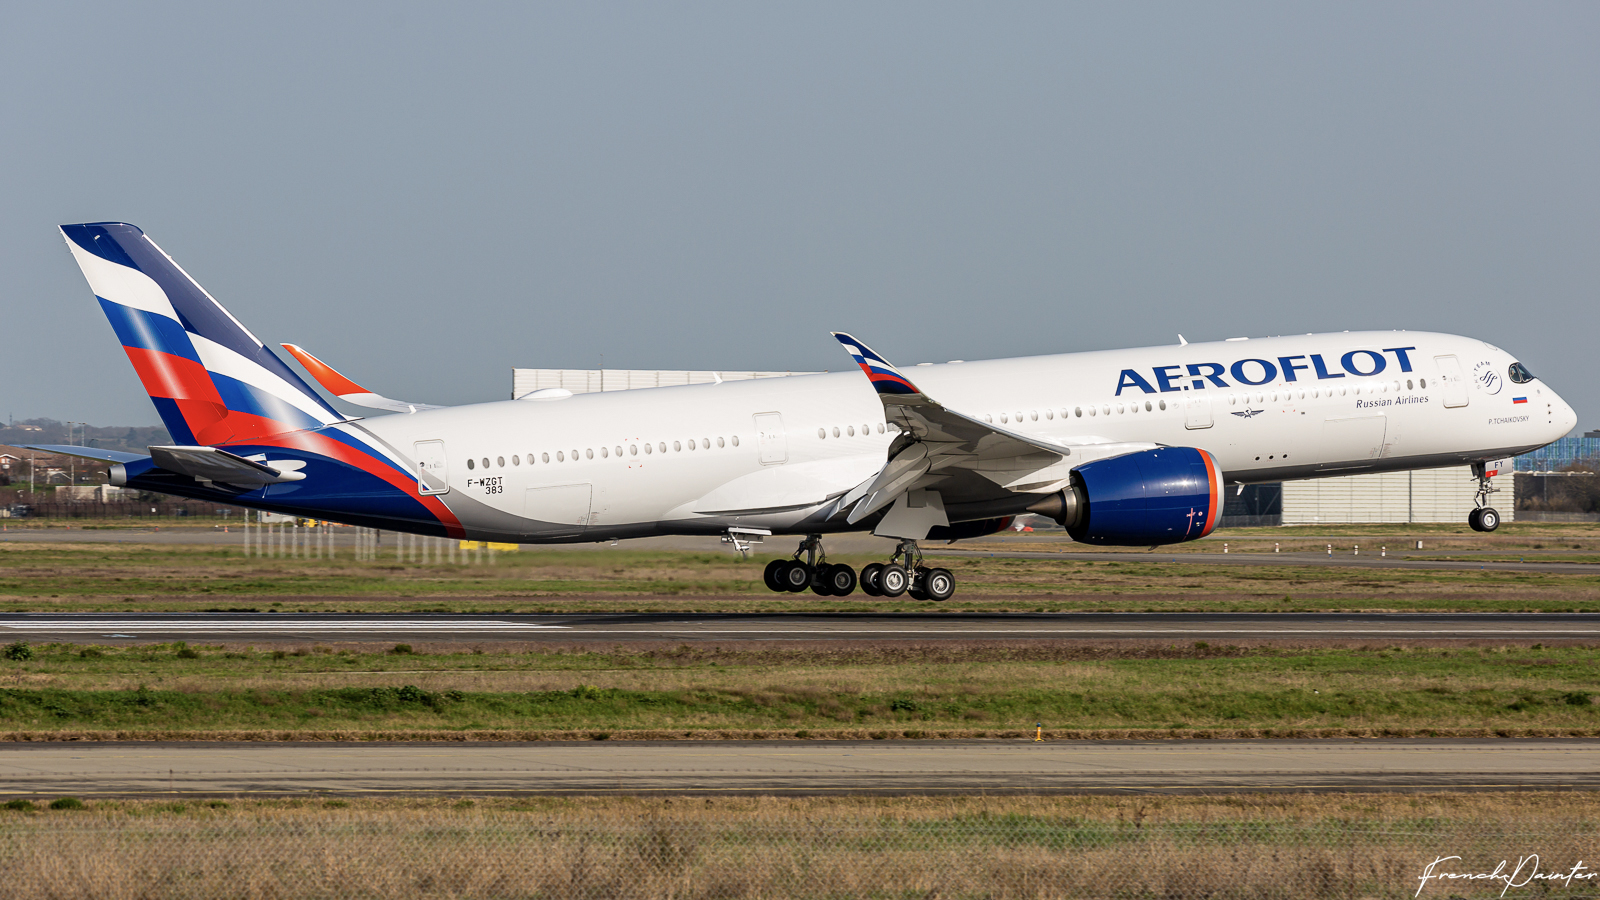 Aeroflot ! SU ! AFL - Page 3 EP28khYWAAALIkI?format=jpg&name=large